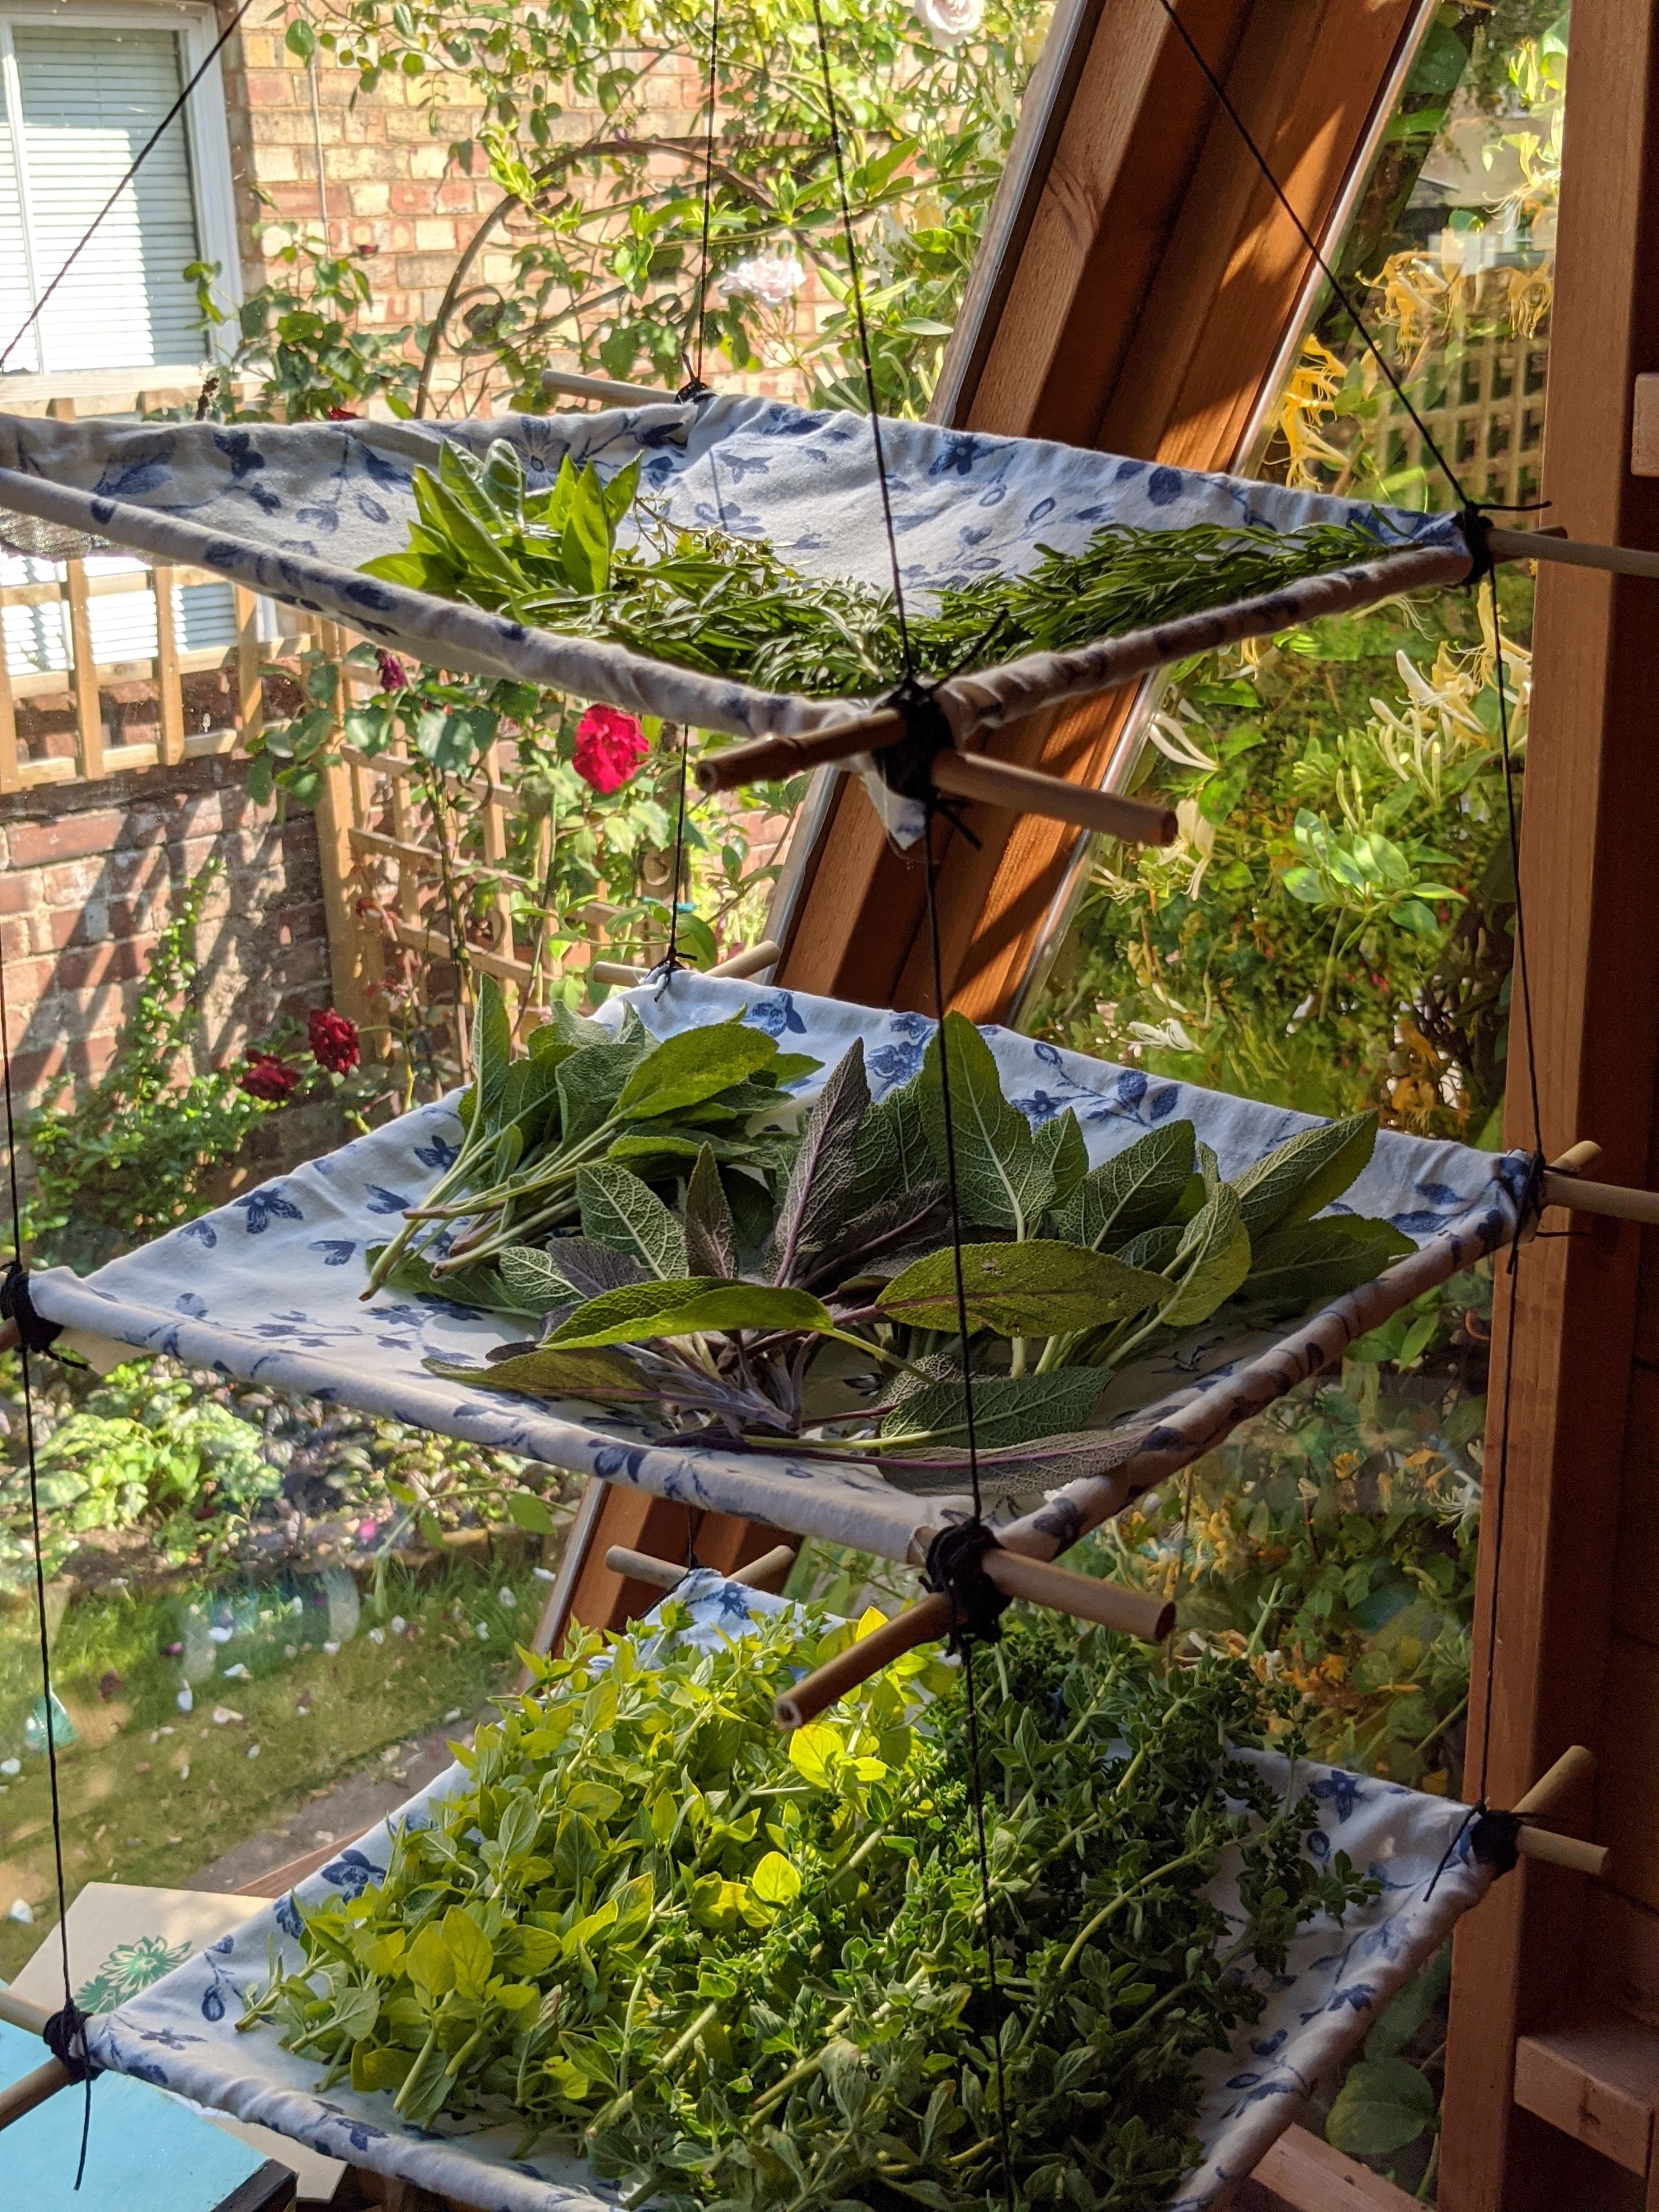 Diy herb drying rack interior design crafts herb drying